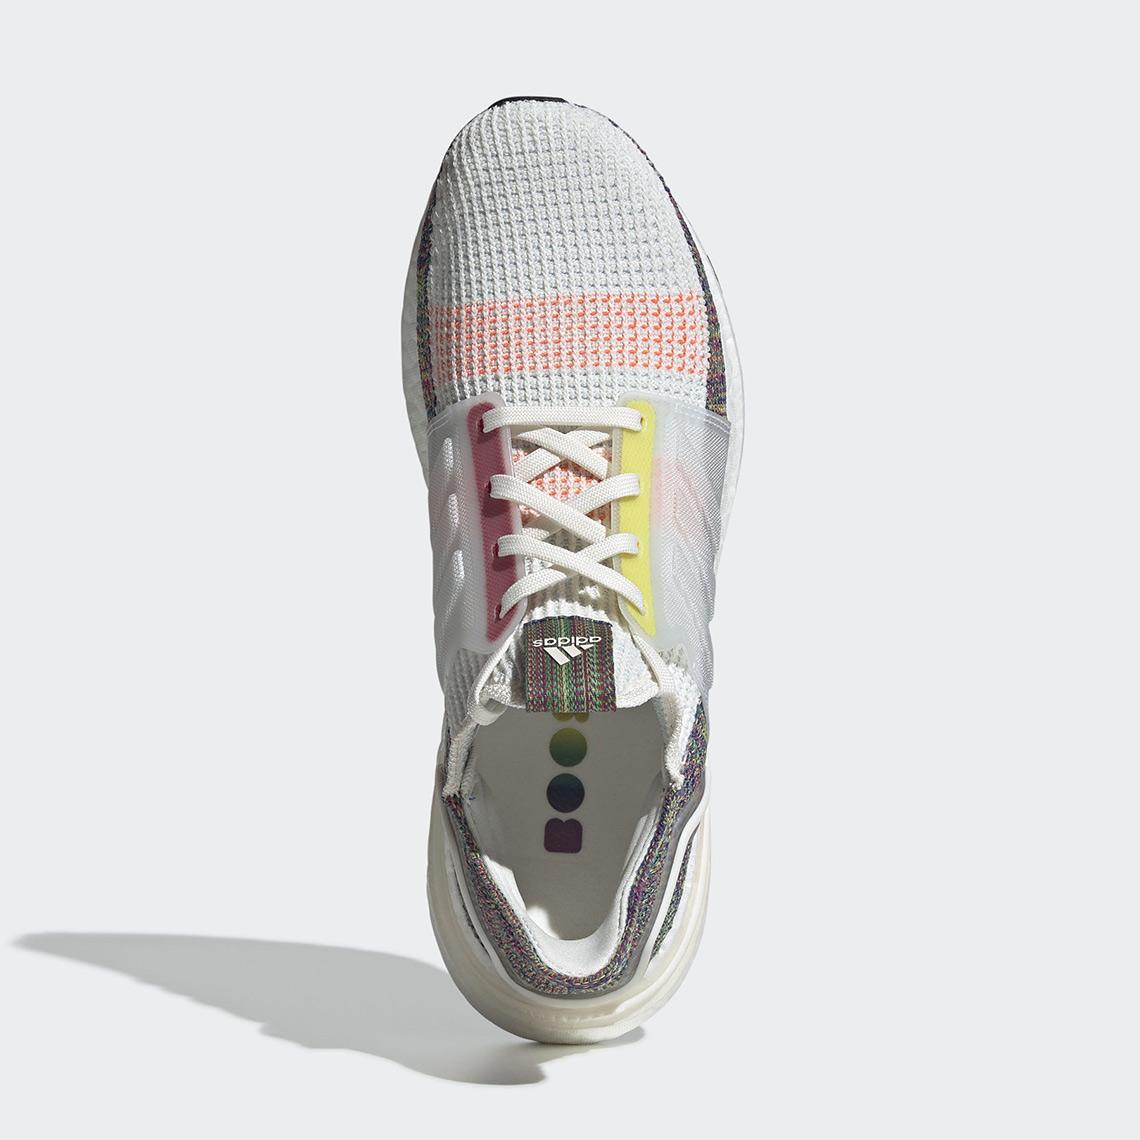 "Adidas UltraBoost 2019 ""Pride"" Celebrates The LGBT Community"